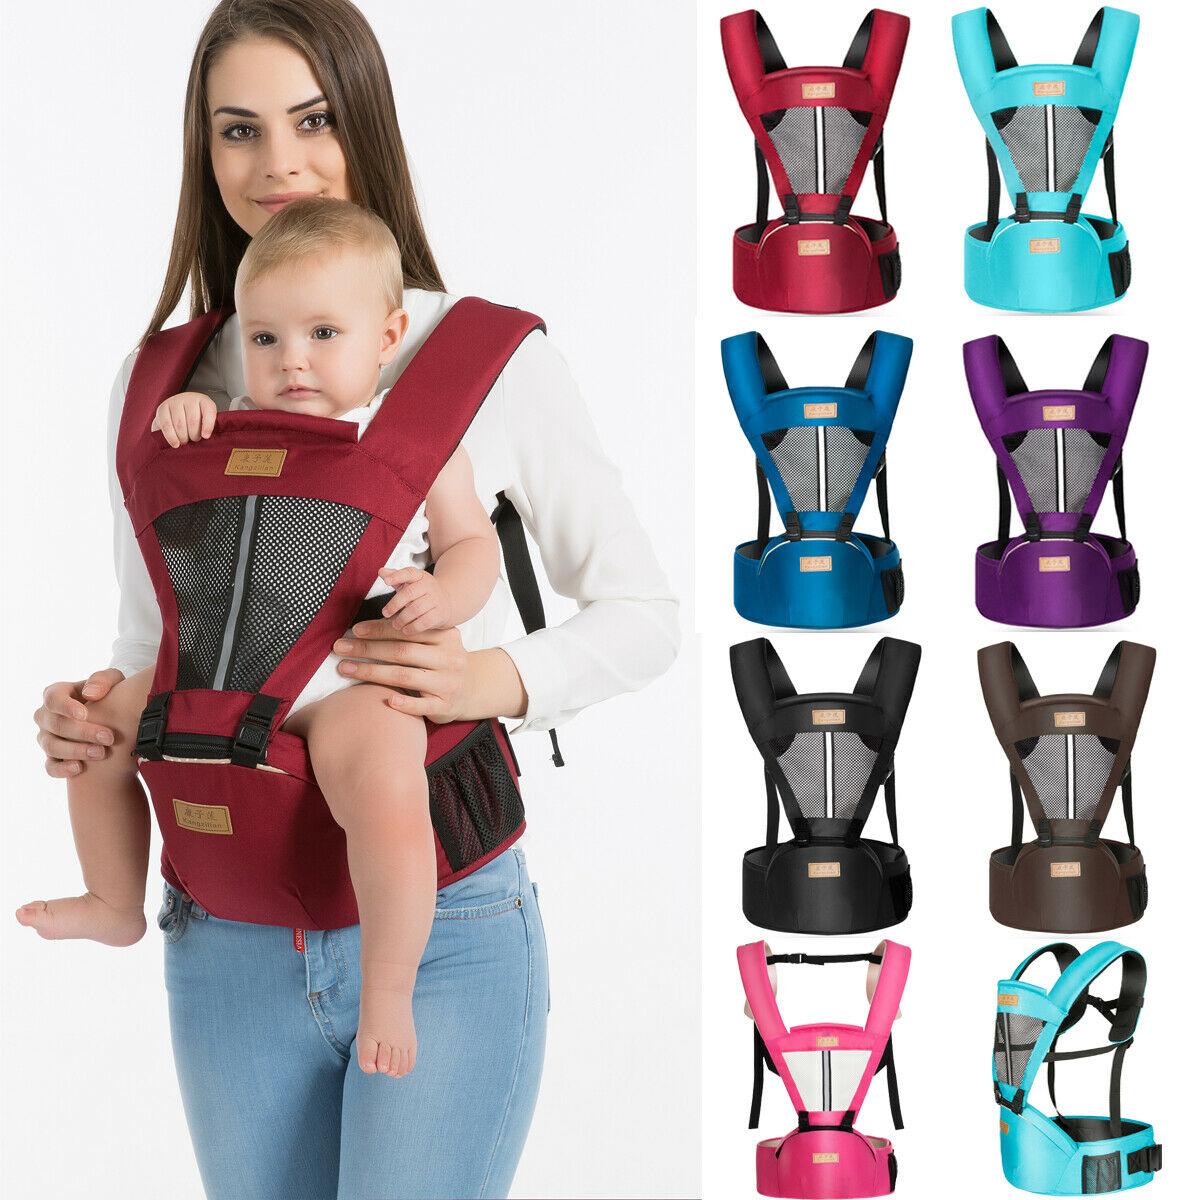 Baby Carrier Sling-Wrap Kangaroo Portable Hipseat Infant Toddler Soft 0-36-Months